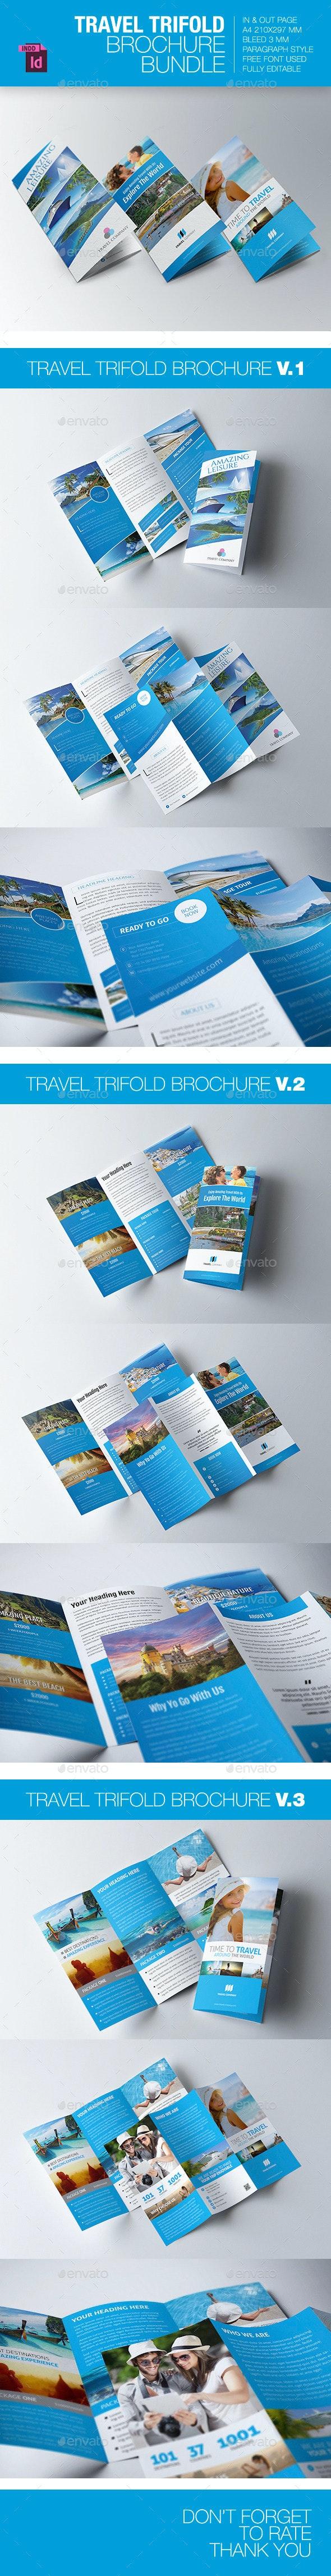 Travel Trifold Brochure Bundle - Brochures Print Templates